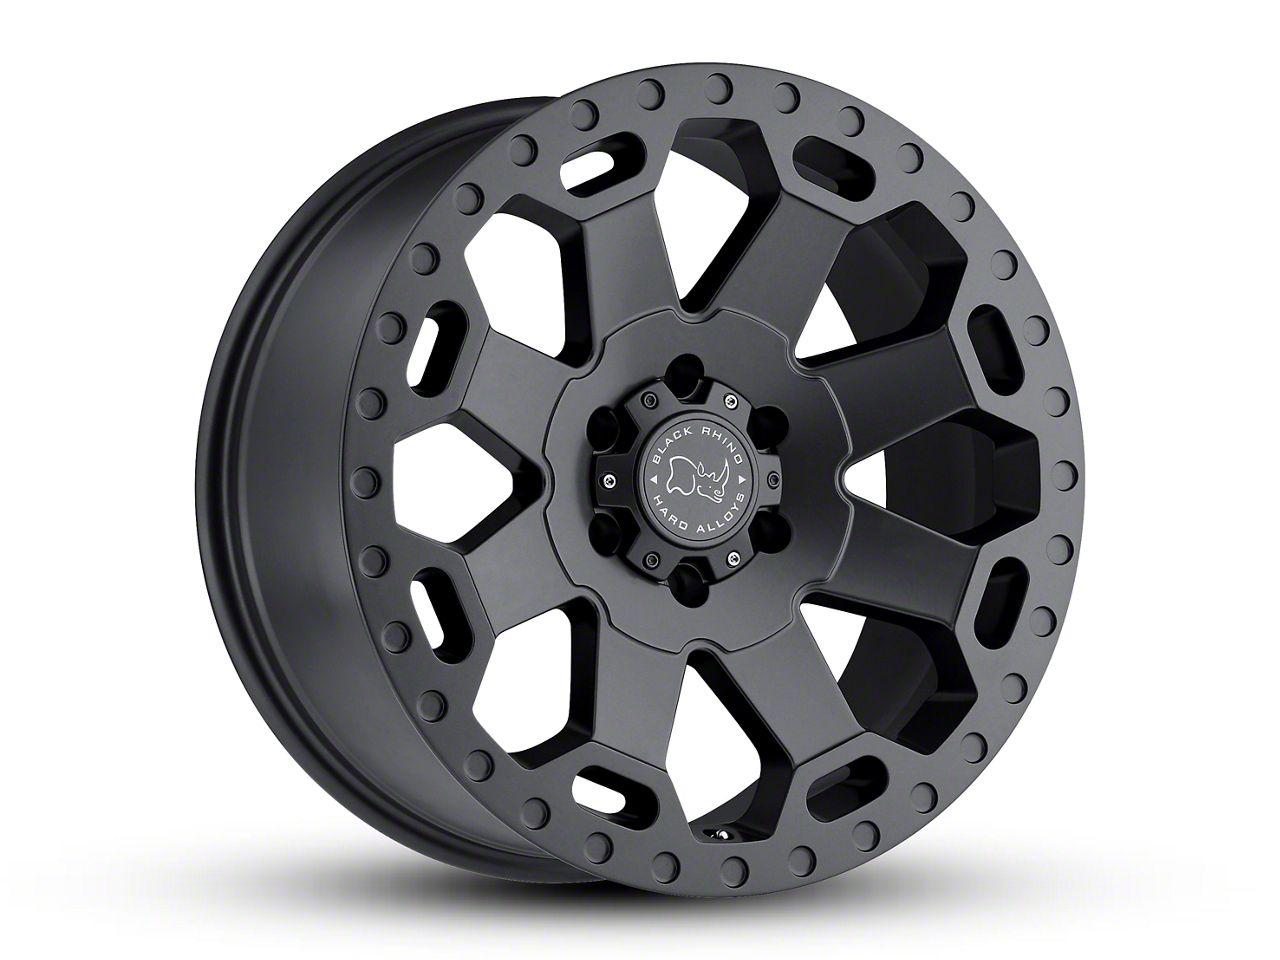 Black Rhino Warlord Matte Gunmetal 5-Lug Wheel - 18x9 (02-18 RAM 1500, Excluding Mega Cab)